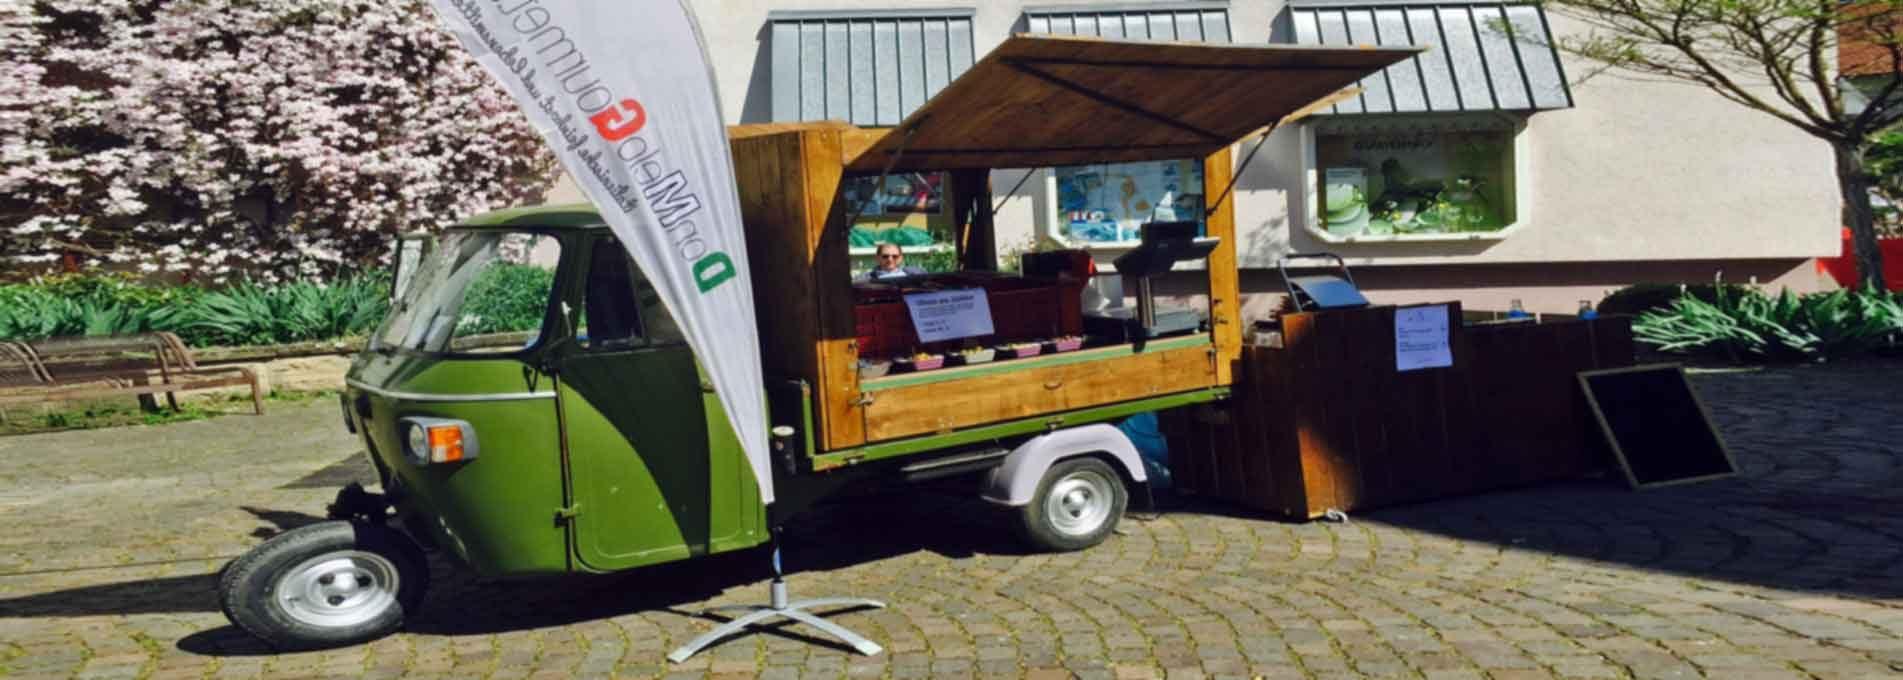 APE - Street-Food-Mobil